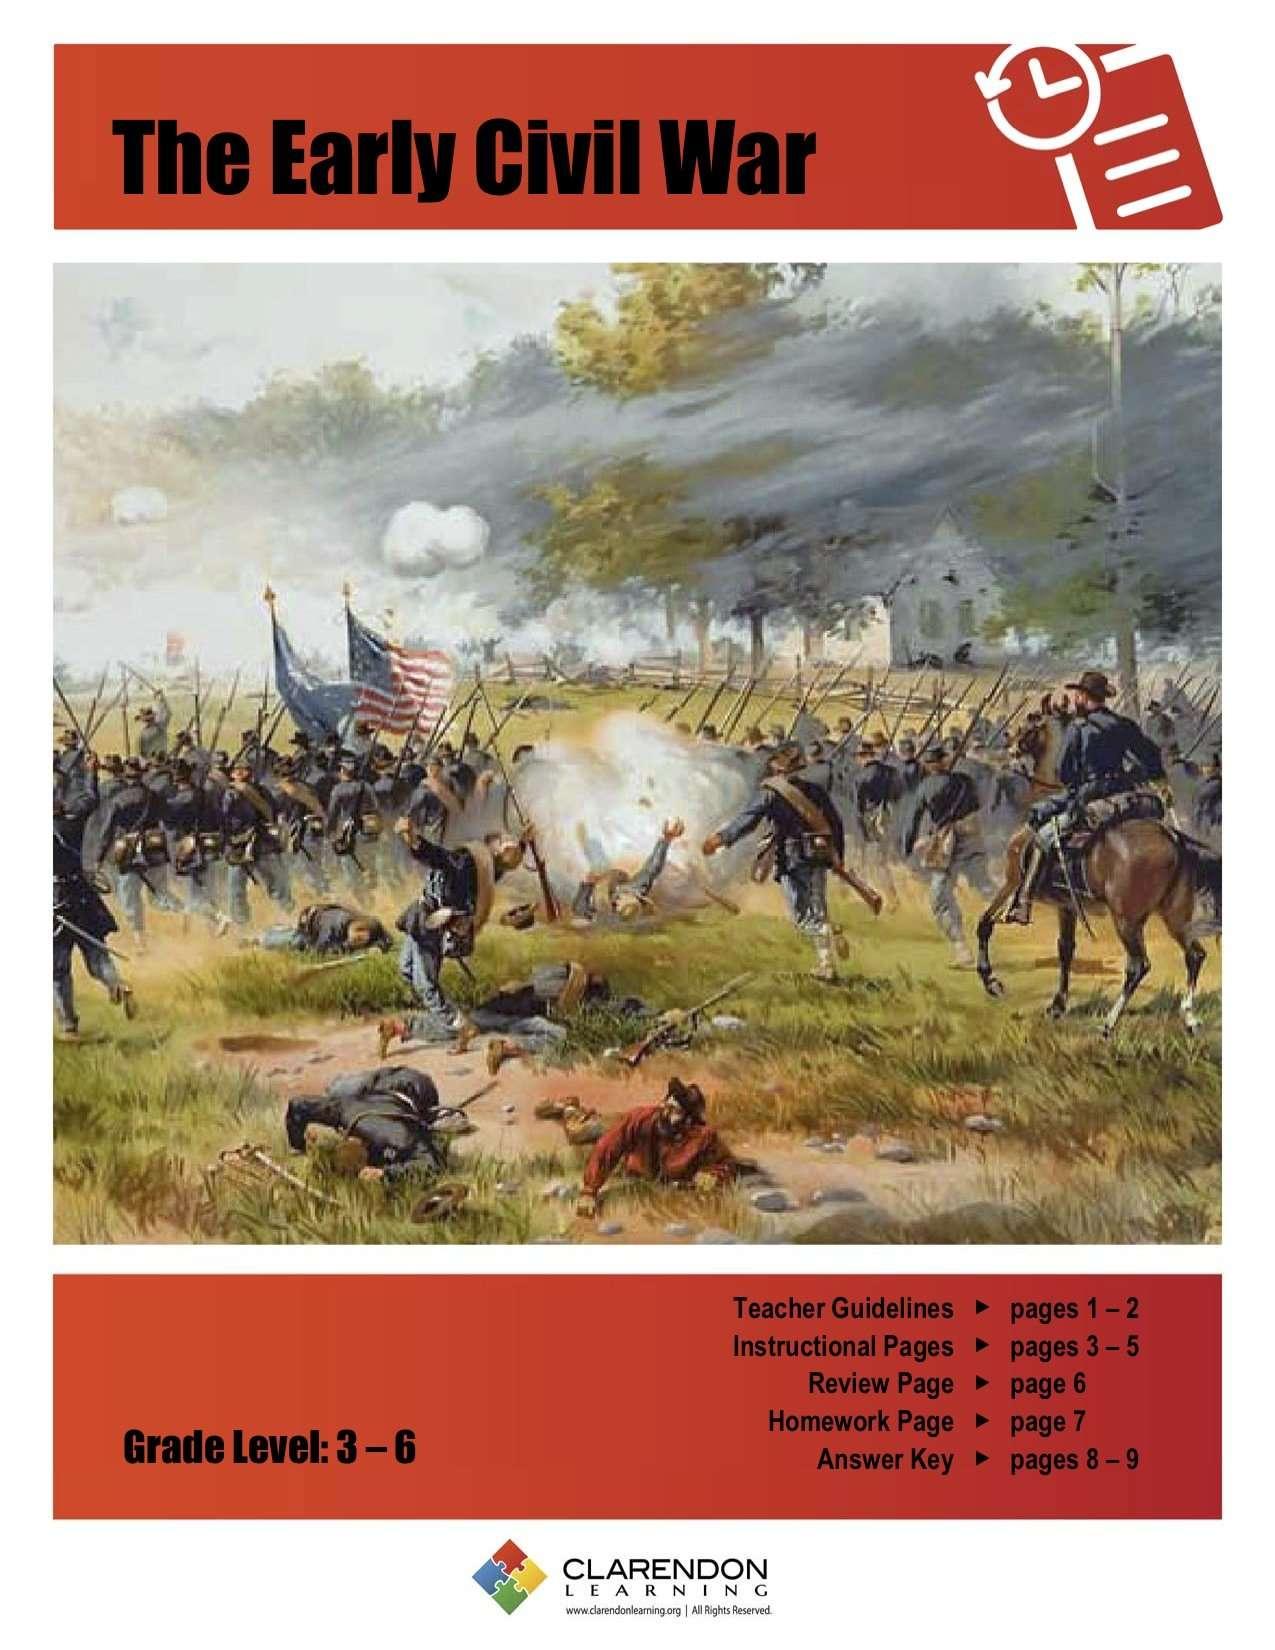 The Civil War Lesson Plan